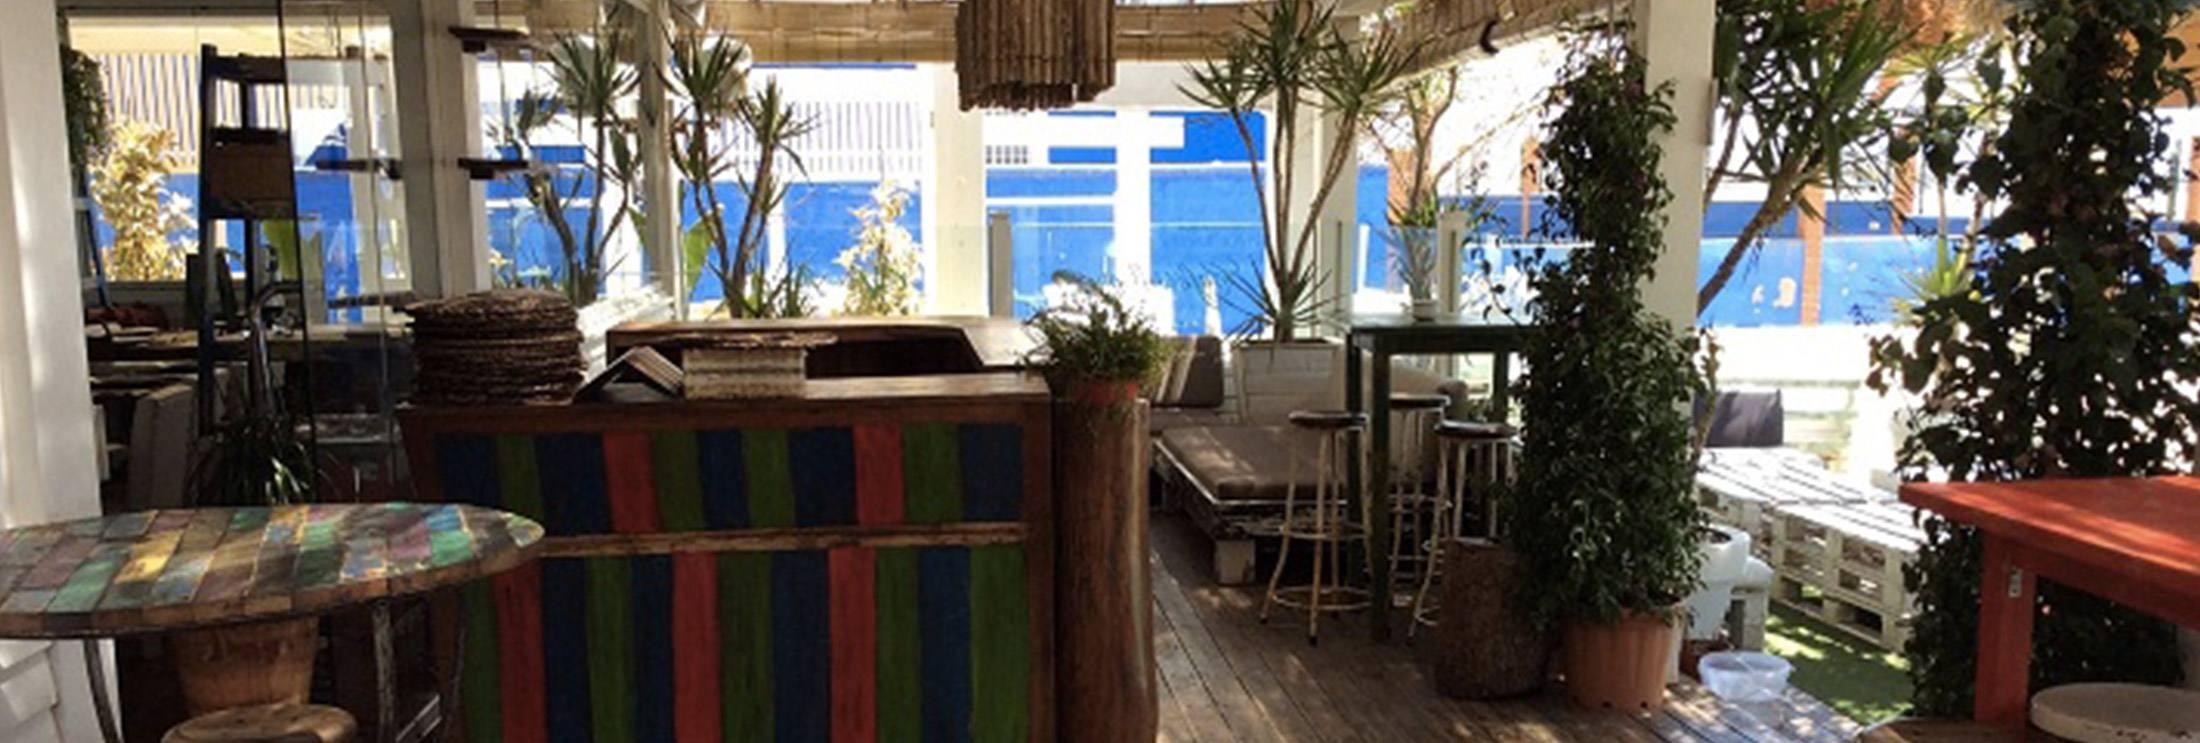 Cafe-del-mar-beach-restaurante-chiringuito-tarifa-balneario-kitesurf school